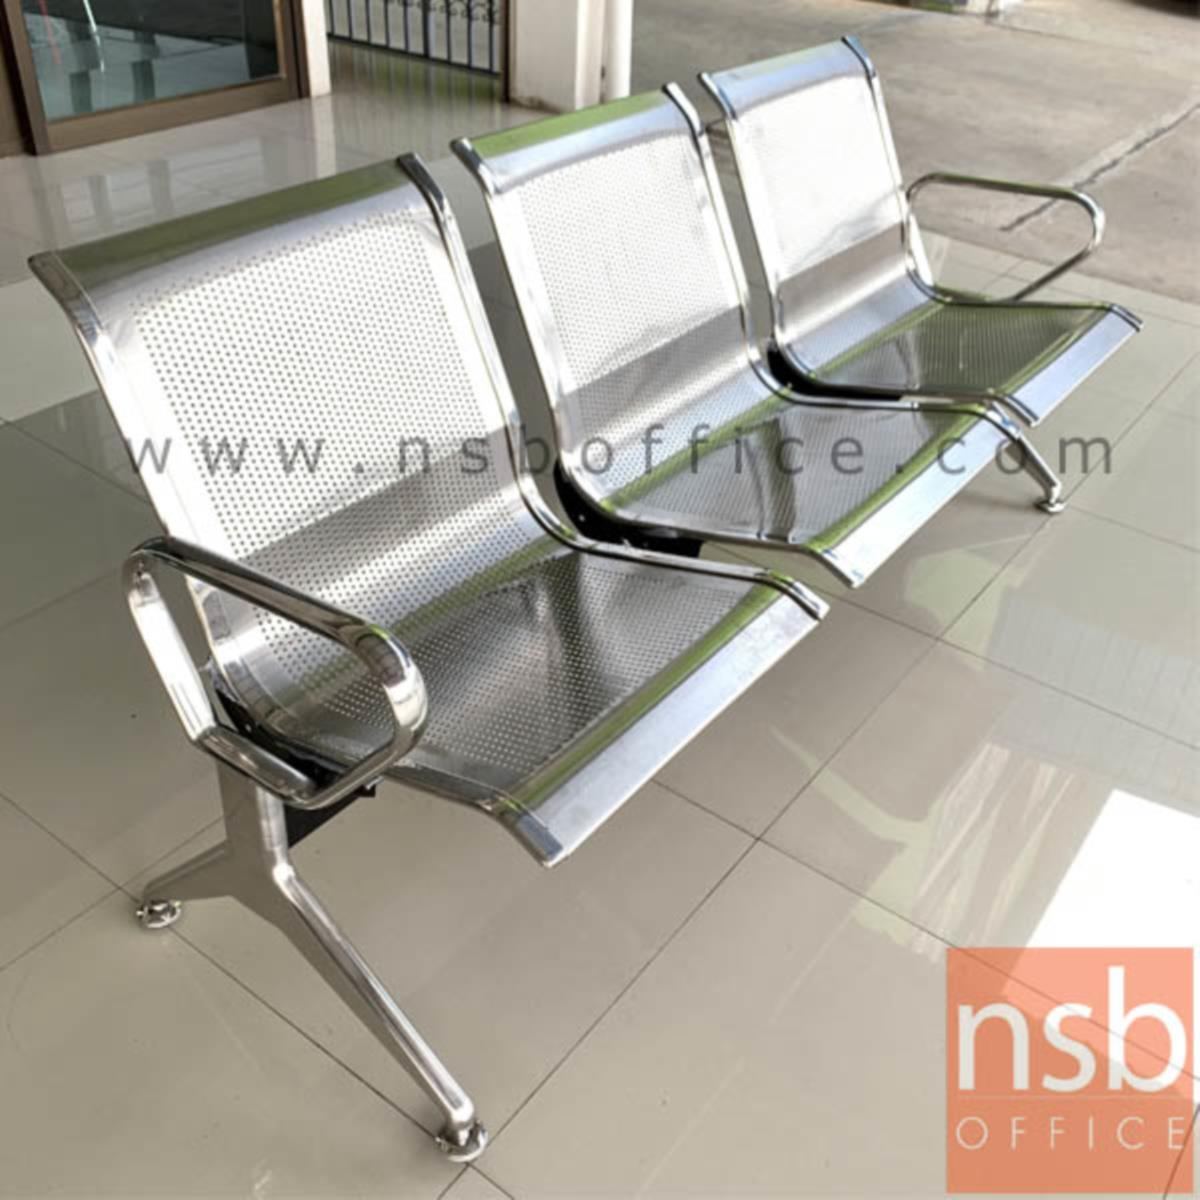 B06A137:เก้าอี้นั่งคอยสแตนเลส แขนตัวโอ รุ่น Pevensie (พีเวนซี่) 3 ,4 ,5 ที่นั่ง ขนาด 180W ,232W ,237W cm.